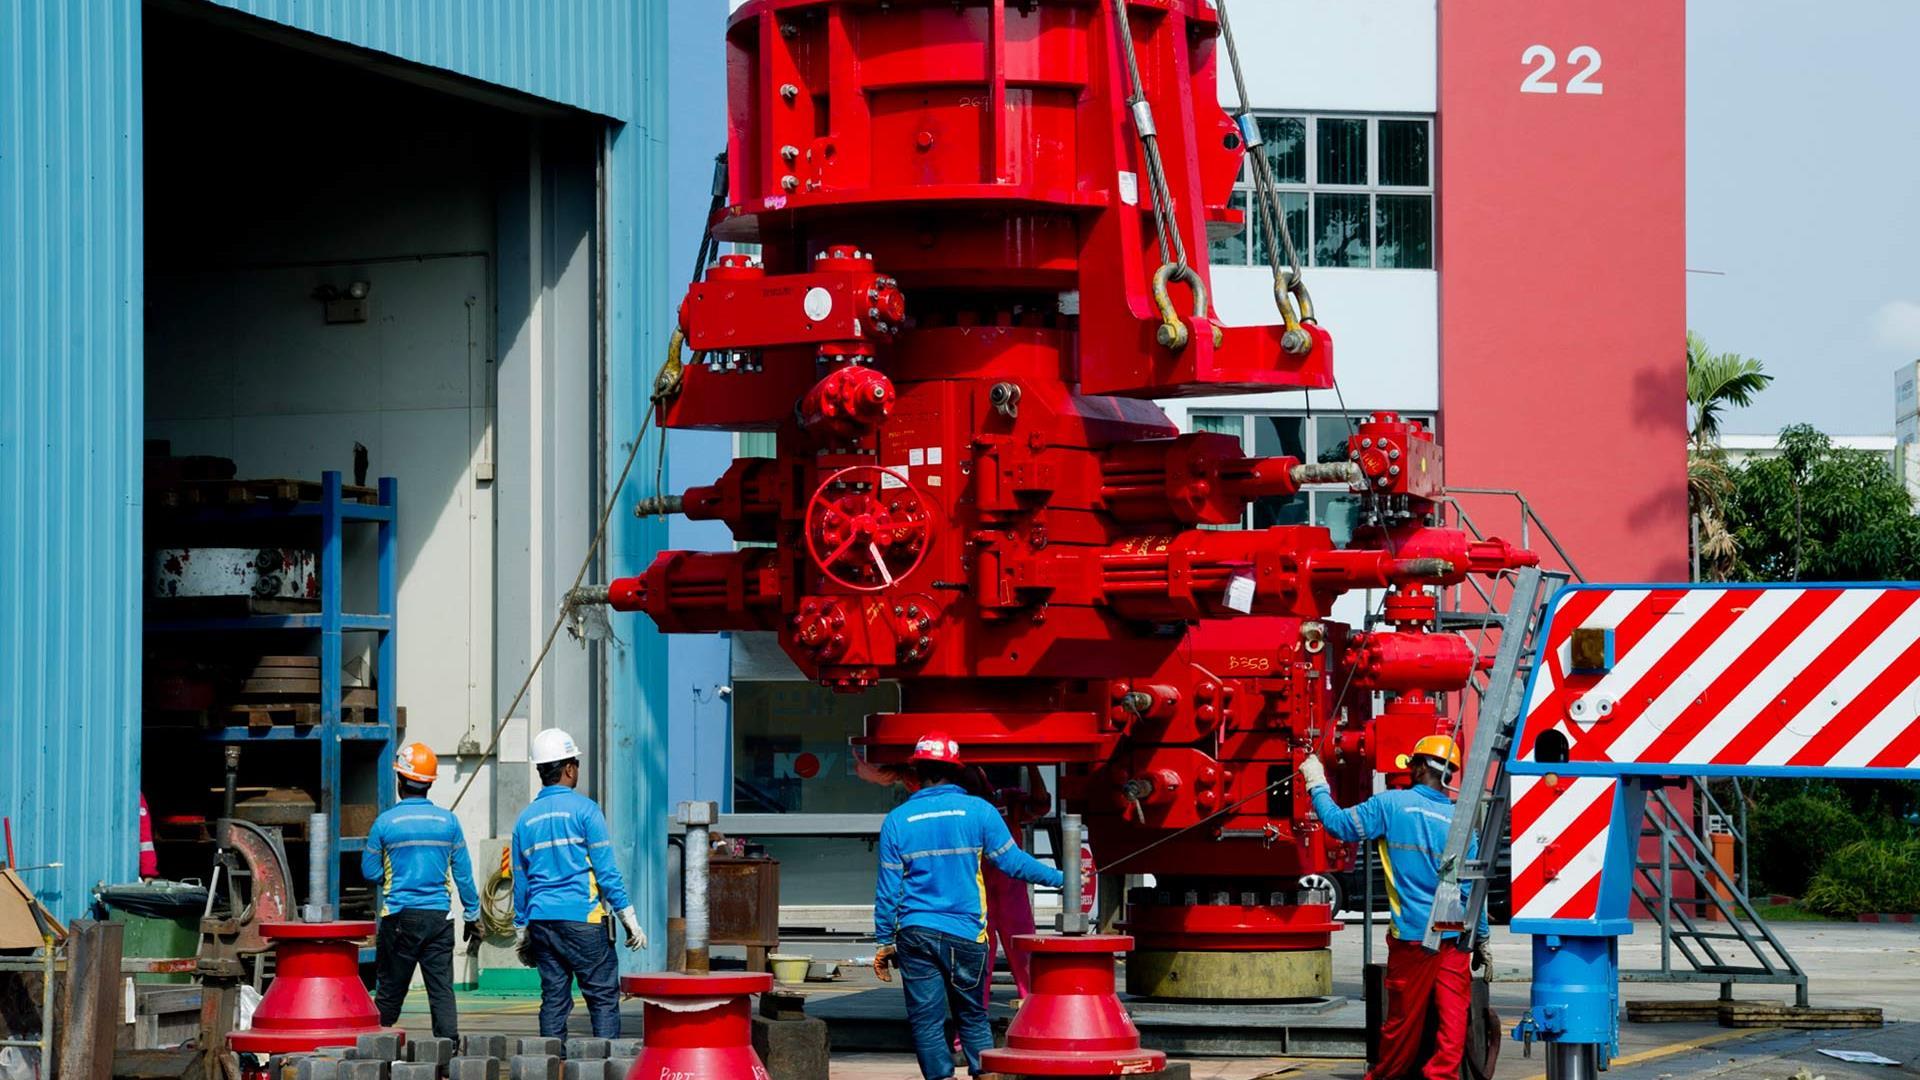 Service and repair of pressure control equipment